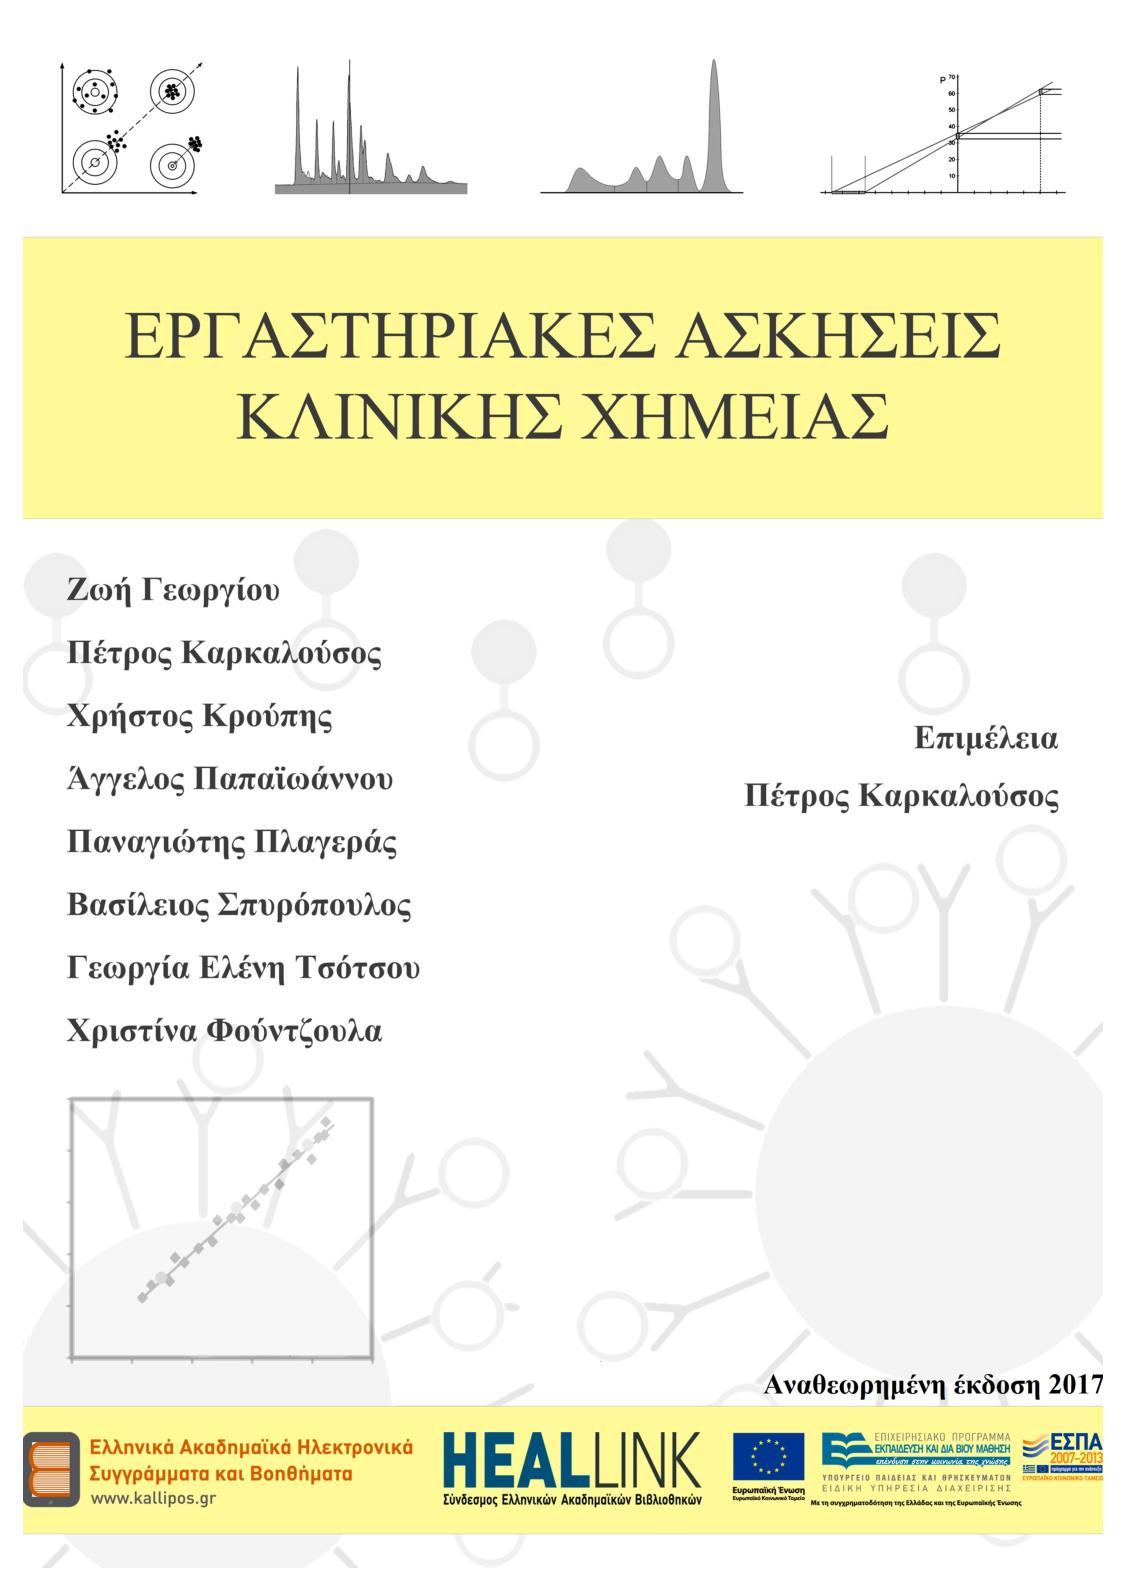 Calaméo - Εργαστηριακές ασκήσεις κλινικής χημείας. 7243f84aa20